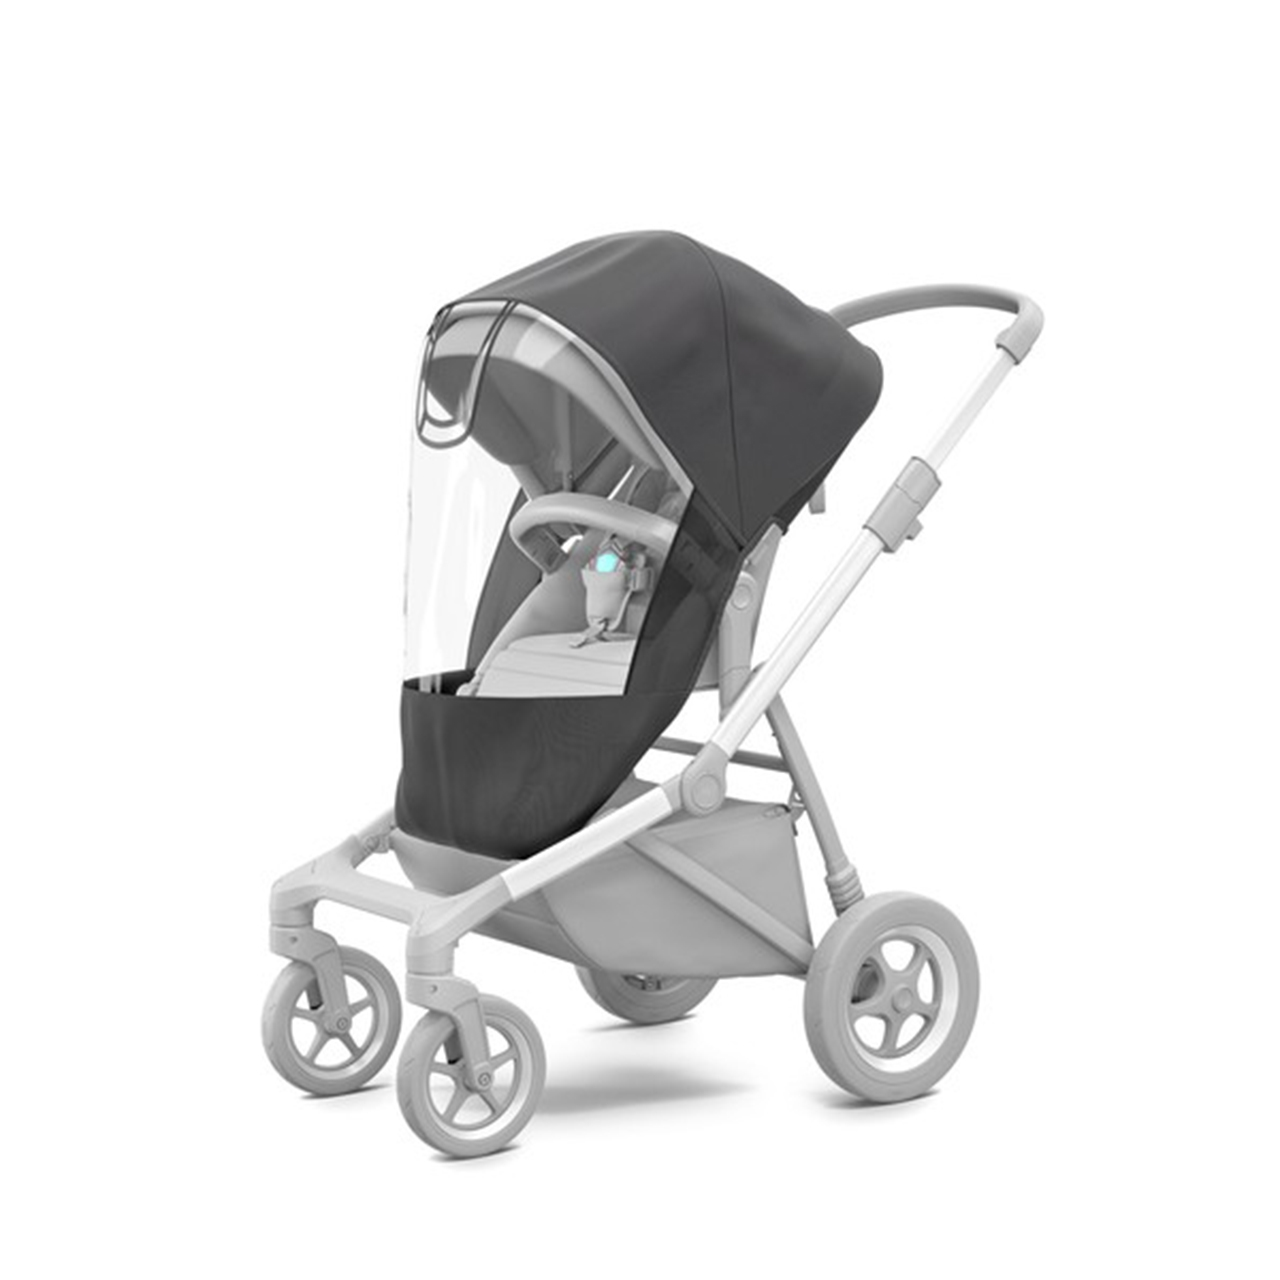 Accesoriu Thule Sleek Sibling Seat - Scaun suplimentar pentru Thule Sleek Midnight Black